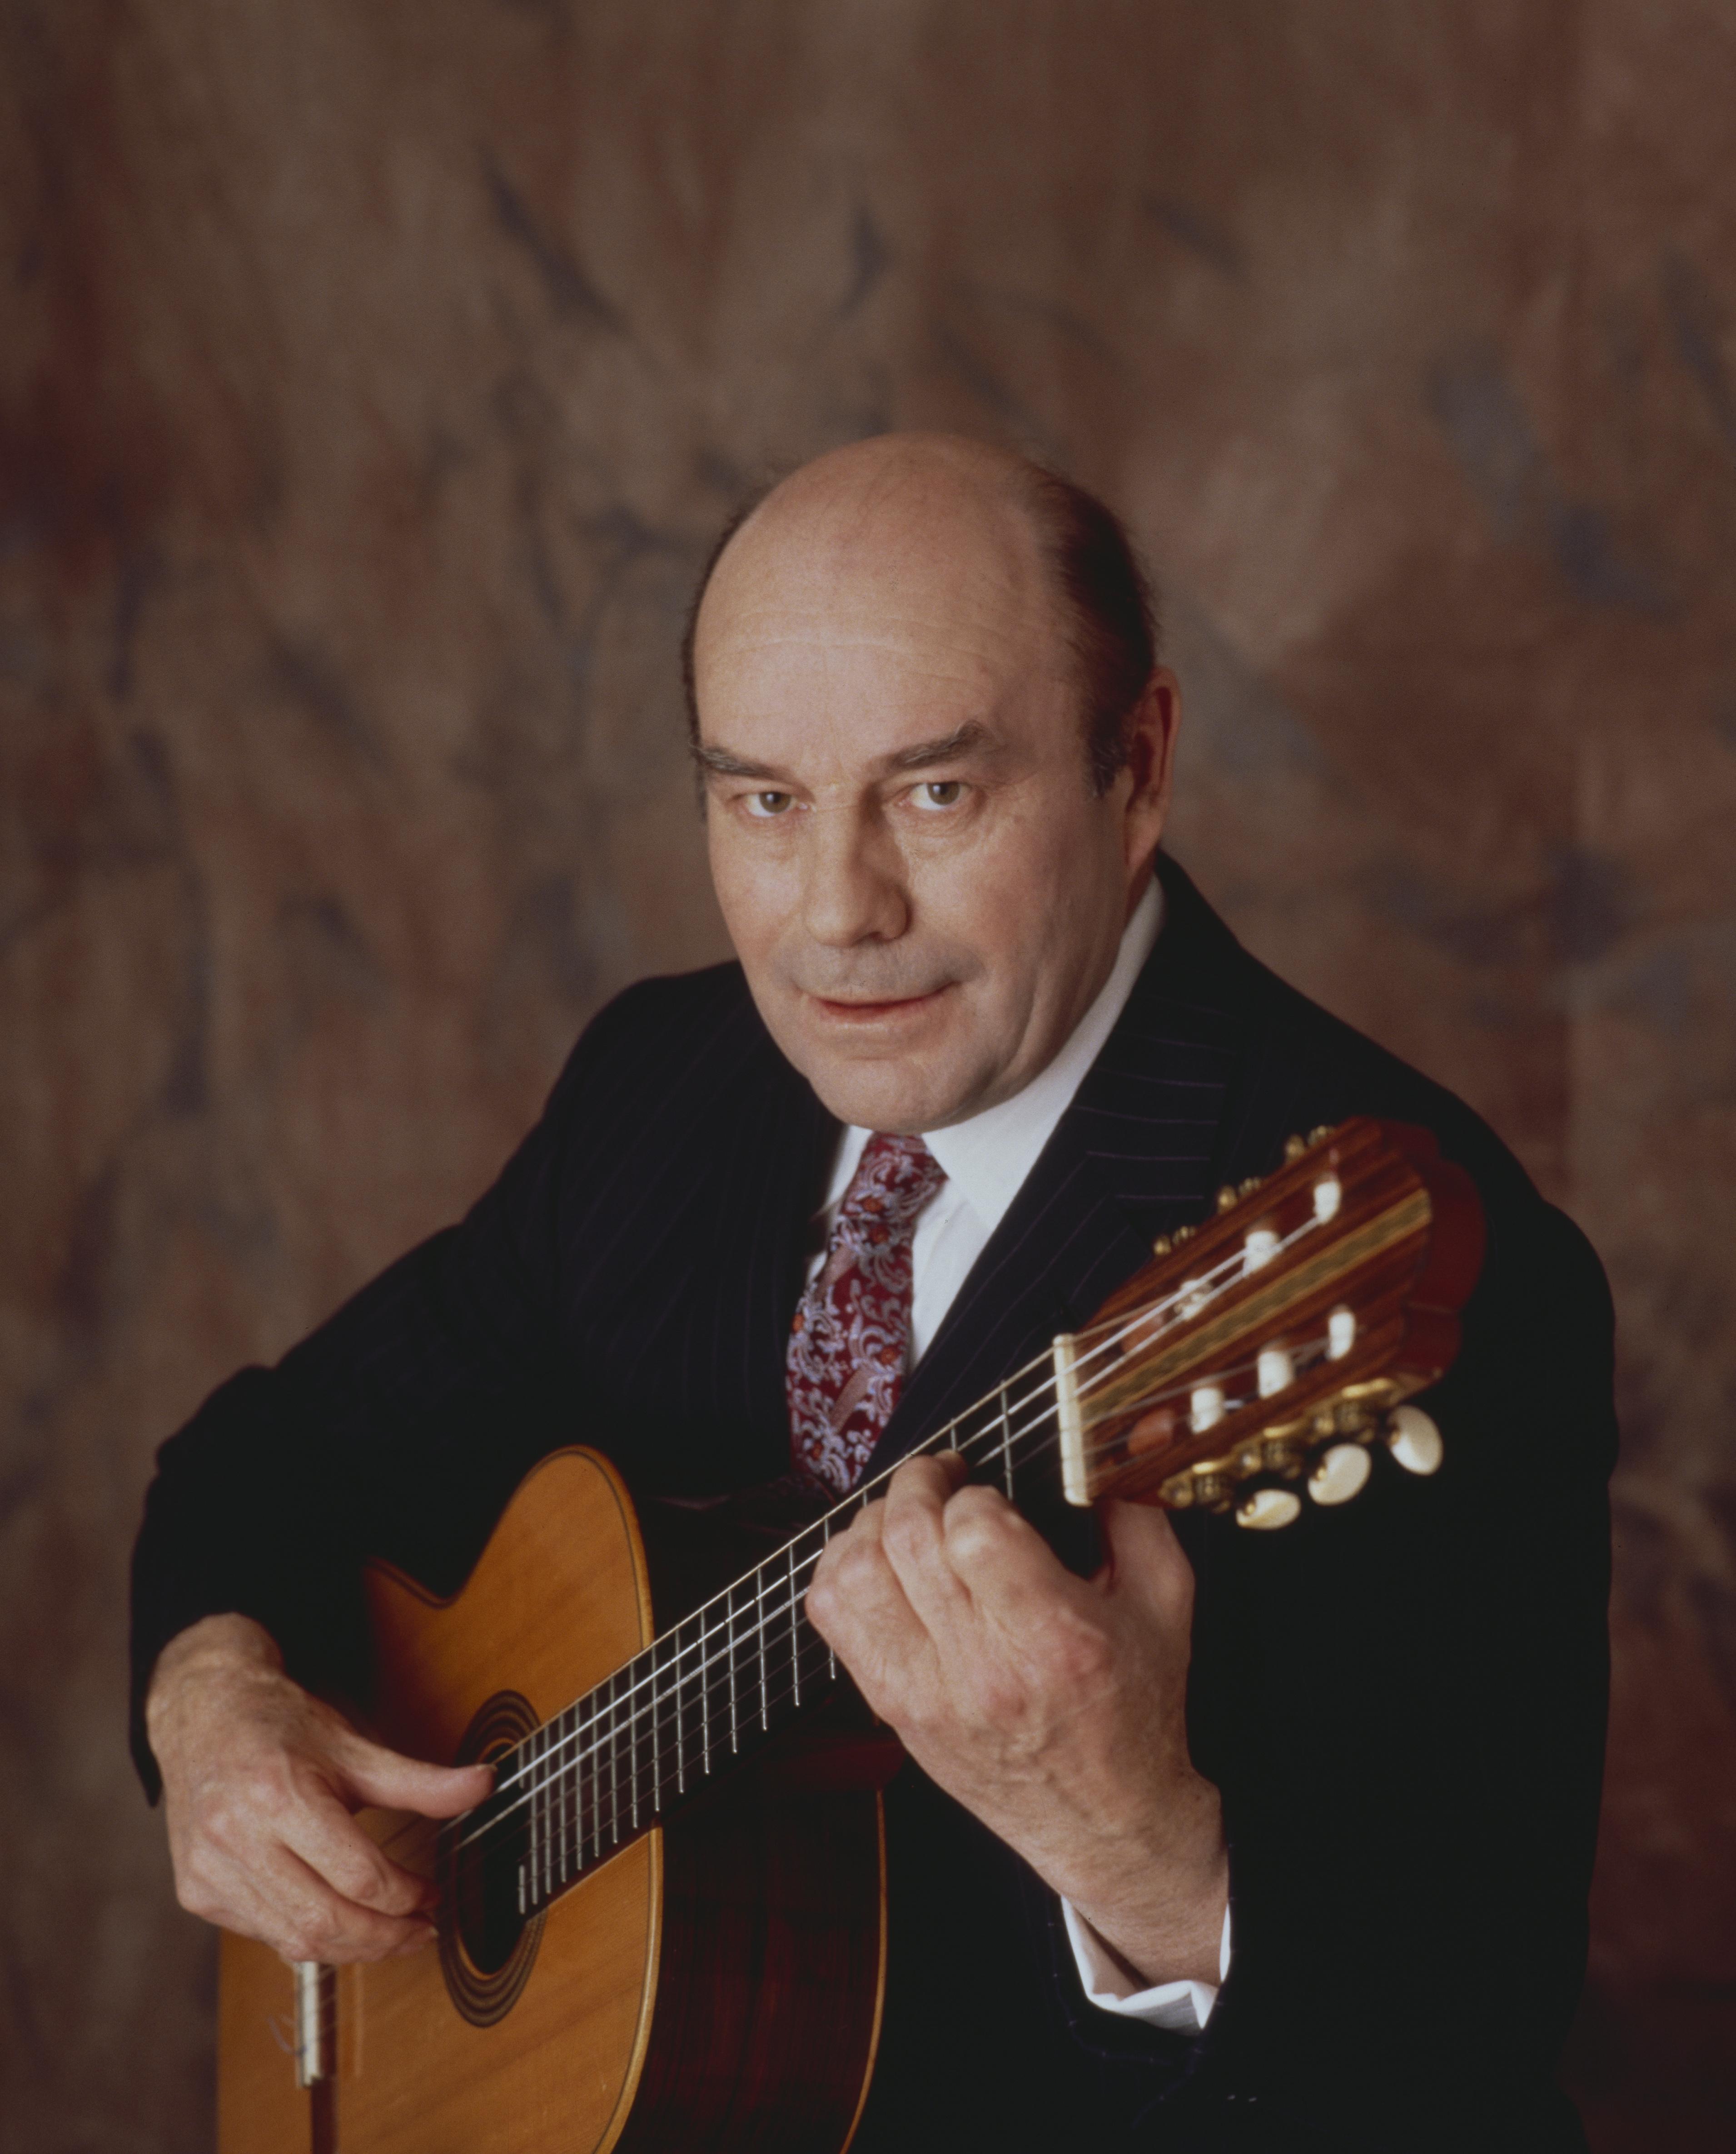 Classical guitarist Julian Bream has died